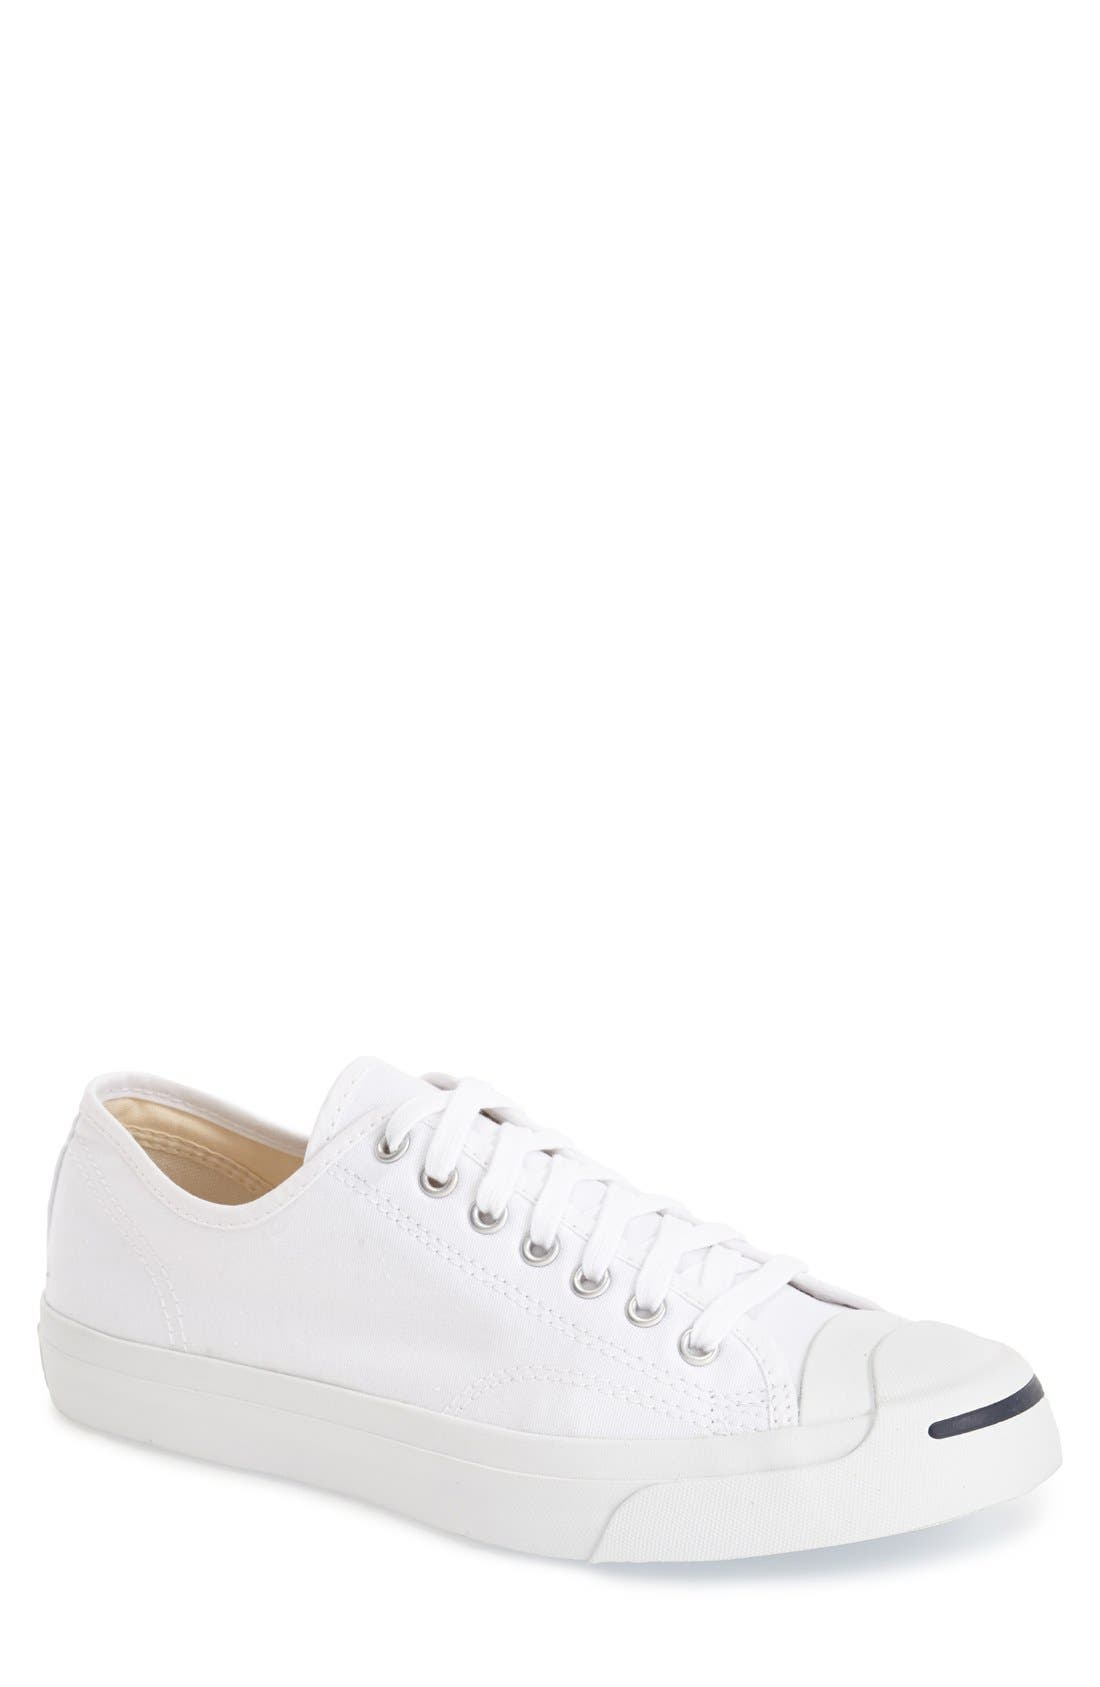 Converse 'Jack Purcell' Sneaker (Men)